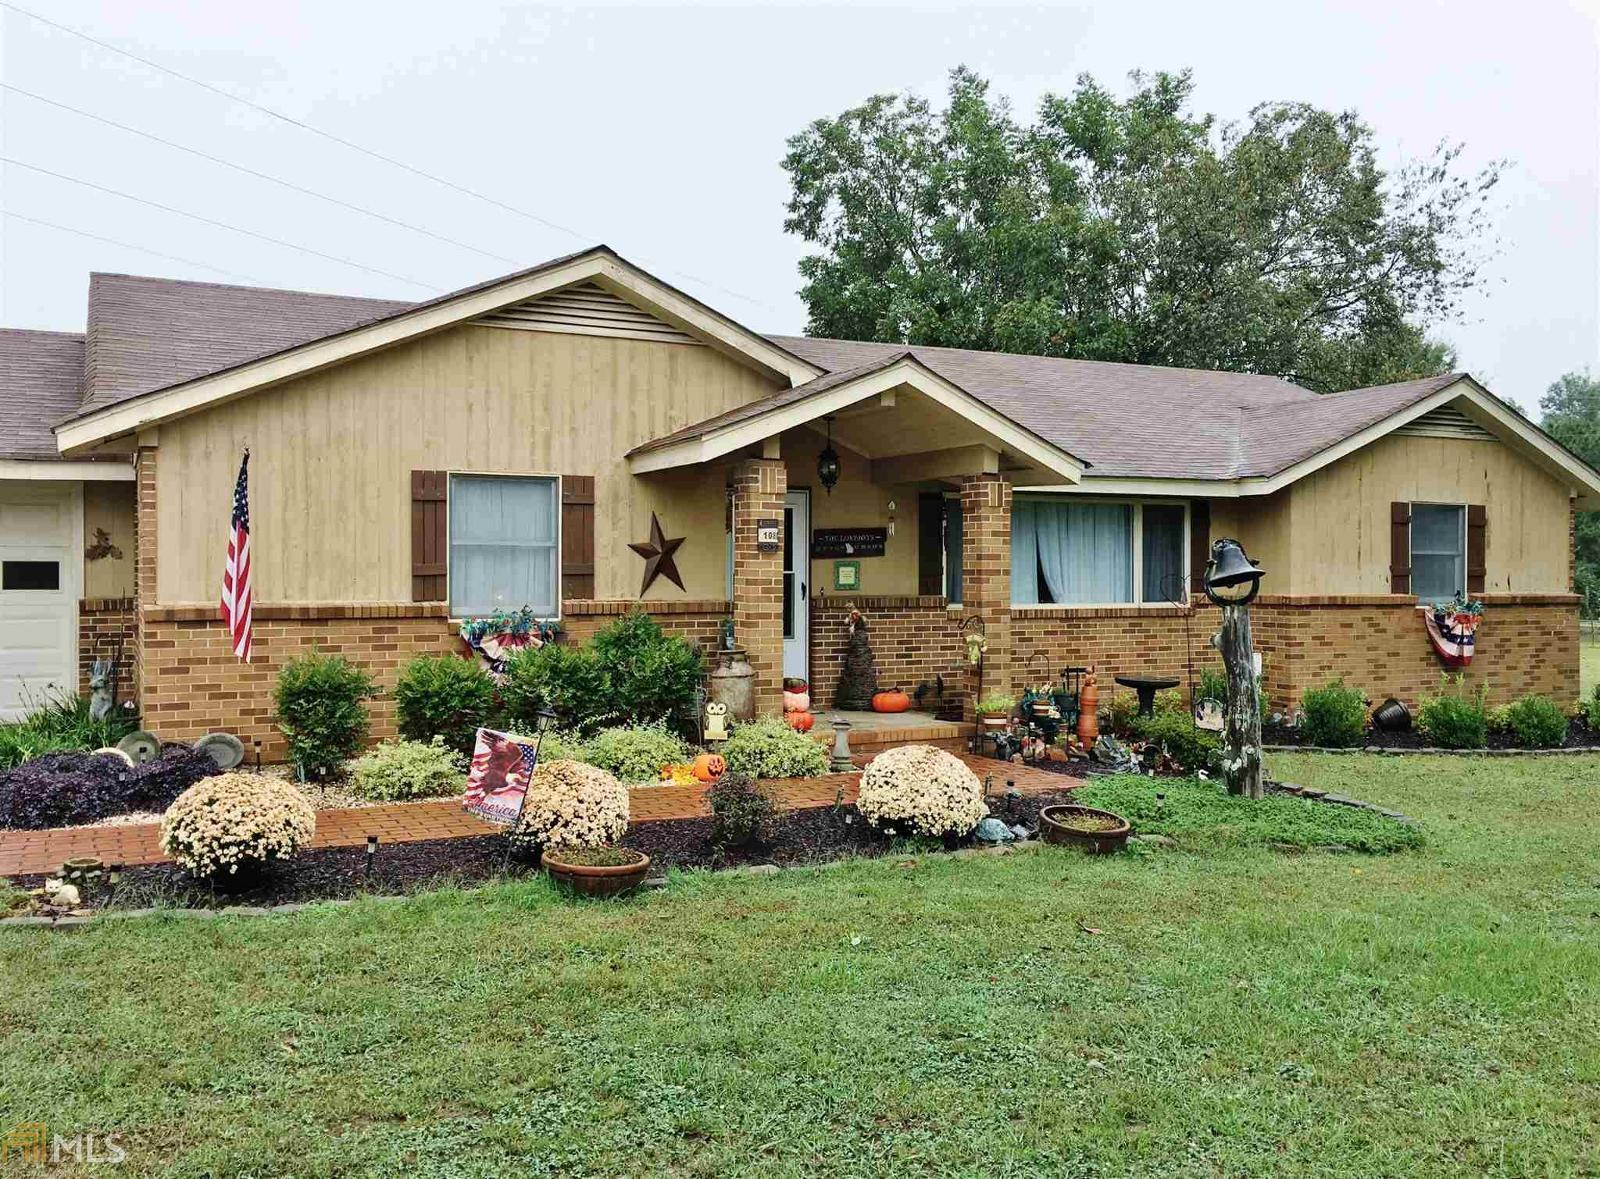 1080 Carmichael Dr 13 Madison Ga Mls 8270900 Better Homes And Gardens Real Estate